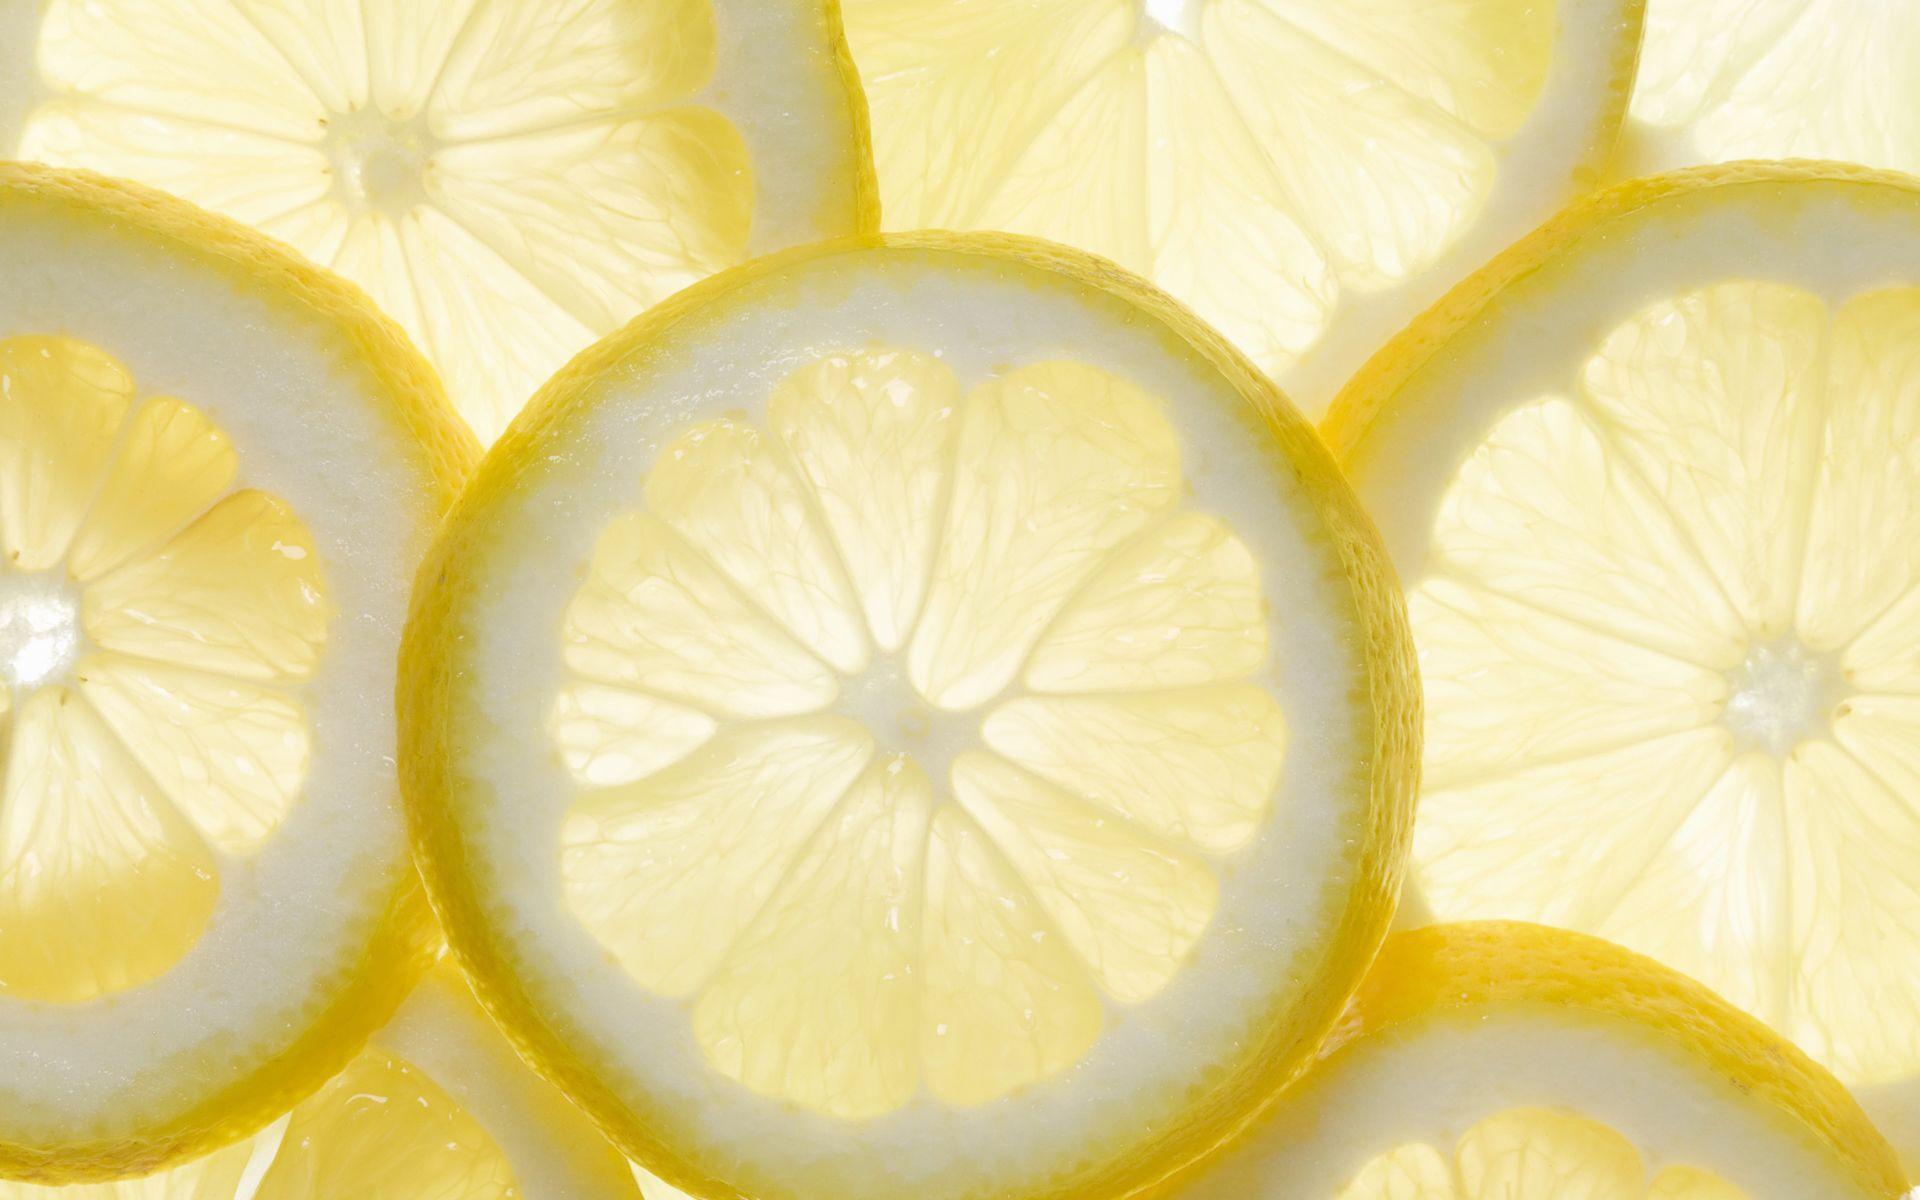 Lemon wallpapers HD quality